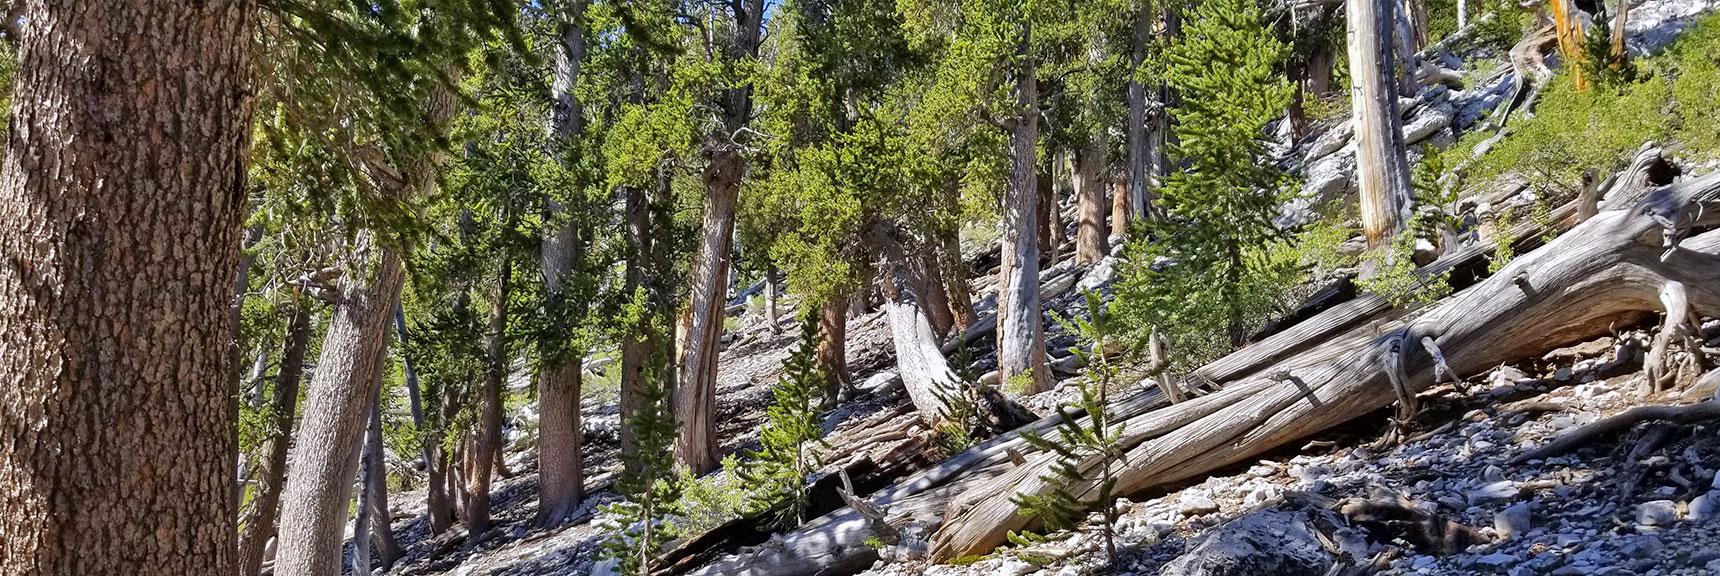 Avalanche Slope Angling Toward Mummy's Toe  Mummy Mountain's Toe, Mt. Charleston Wilderness, Nevada